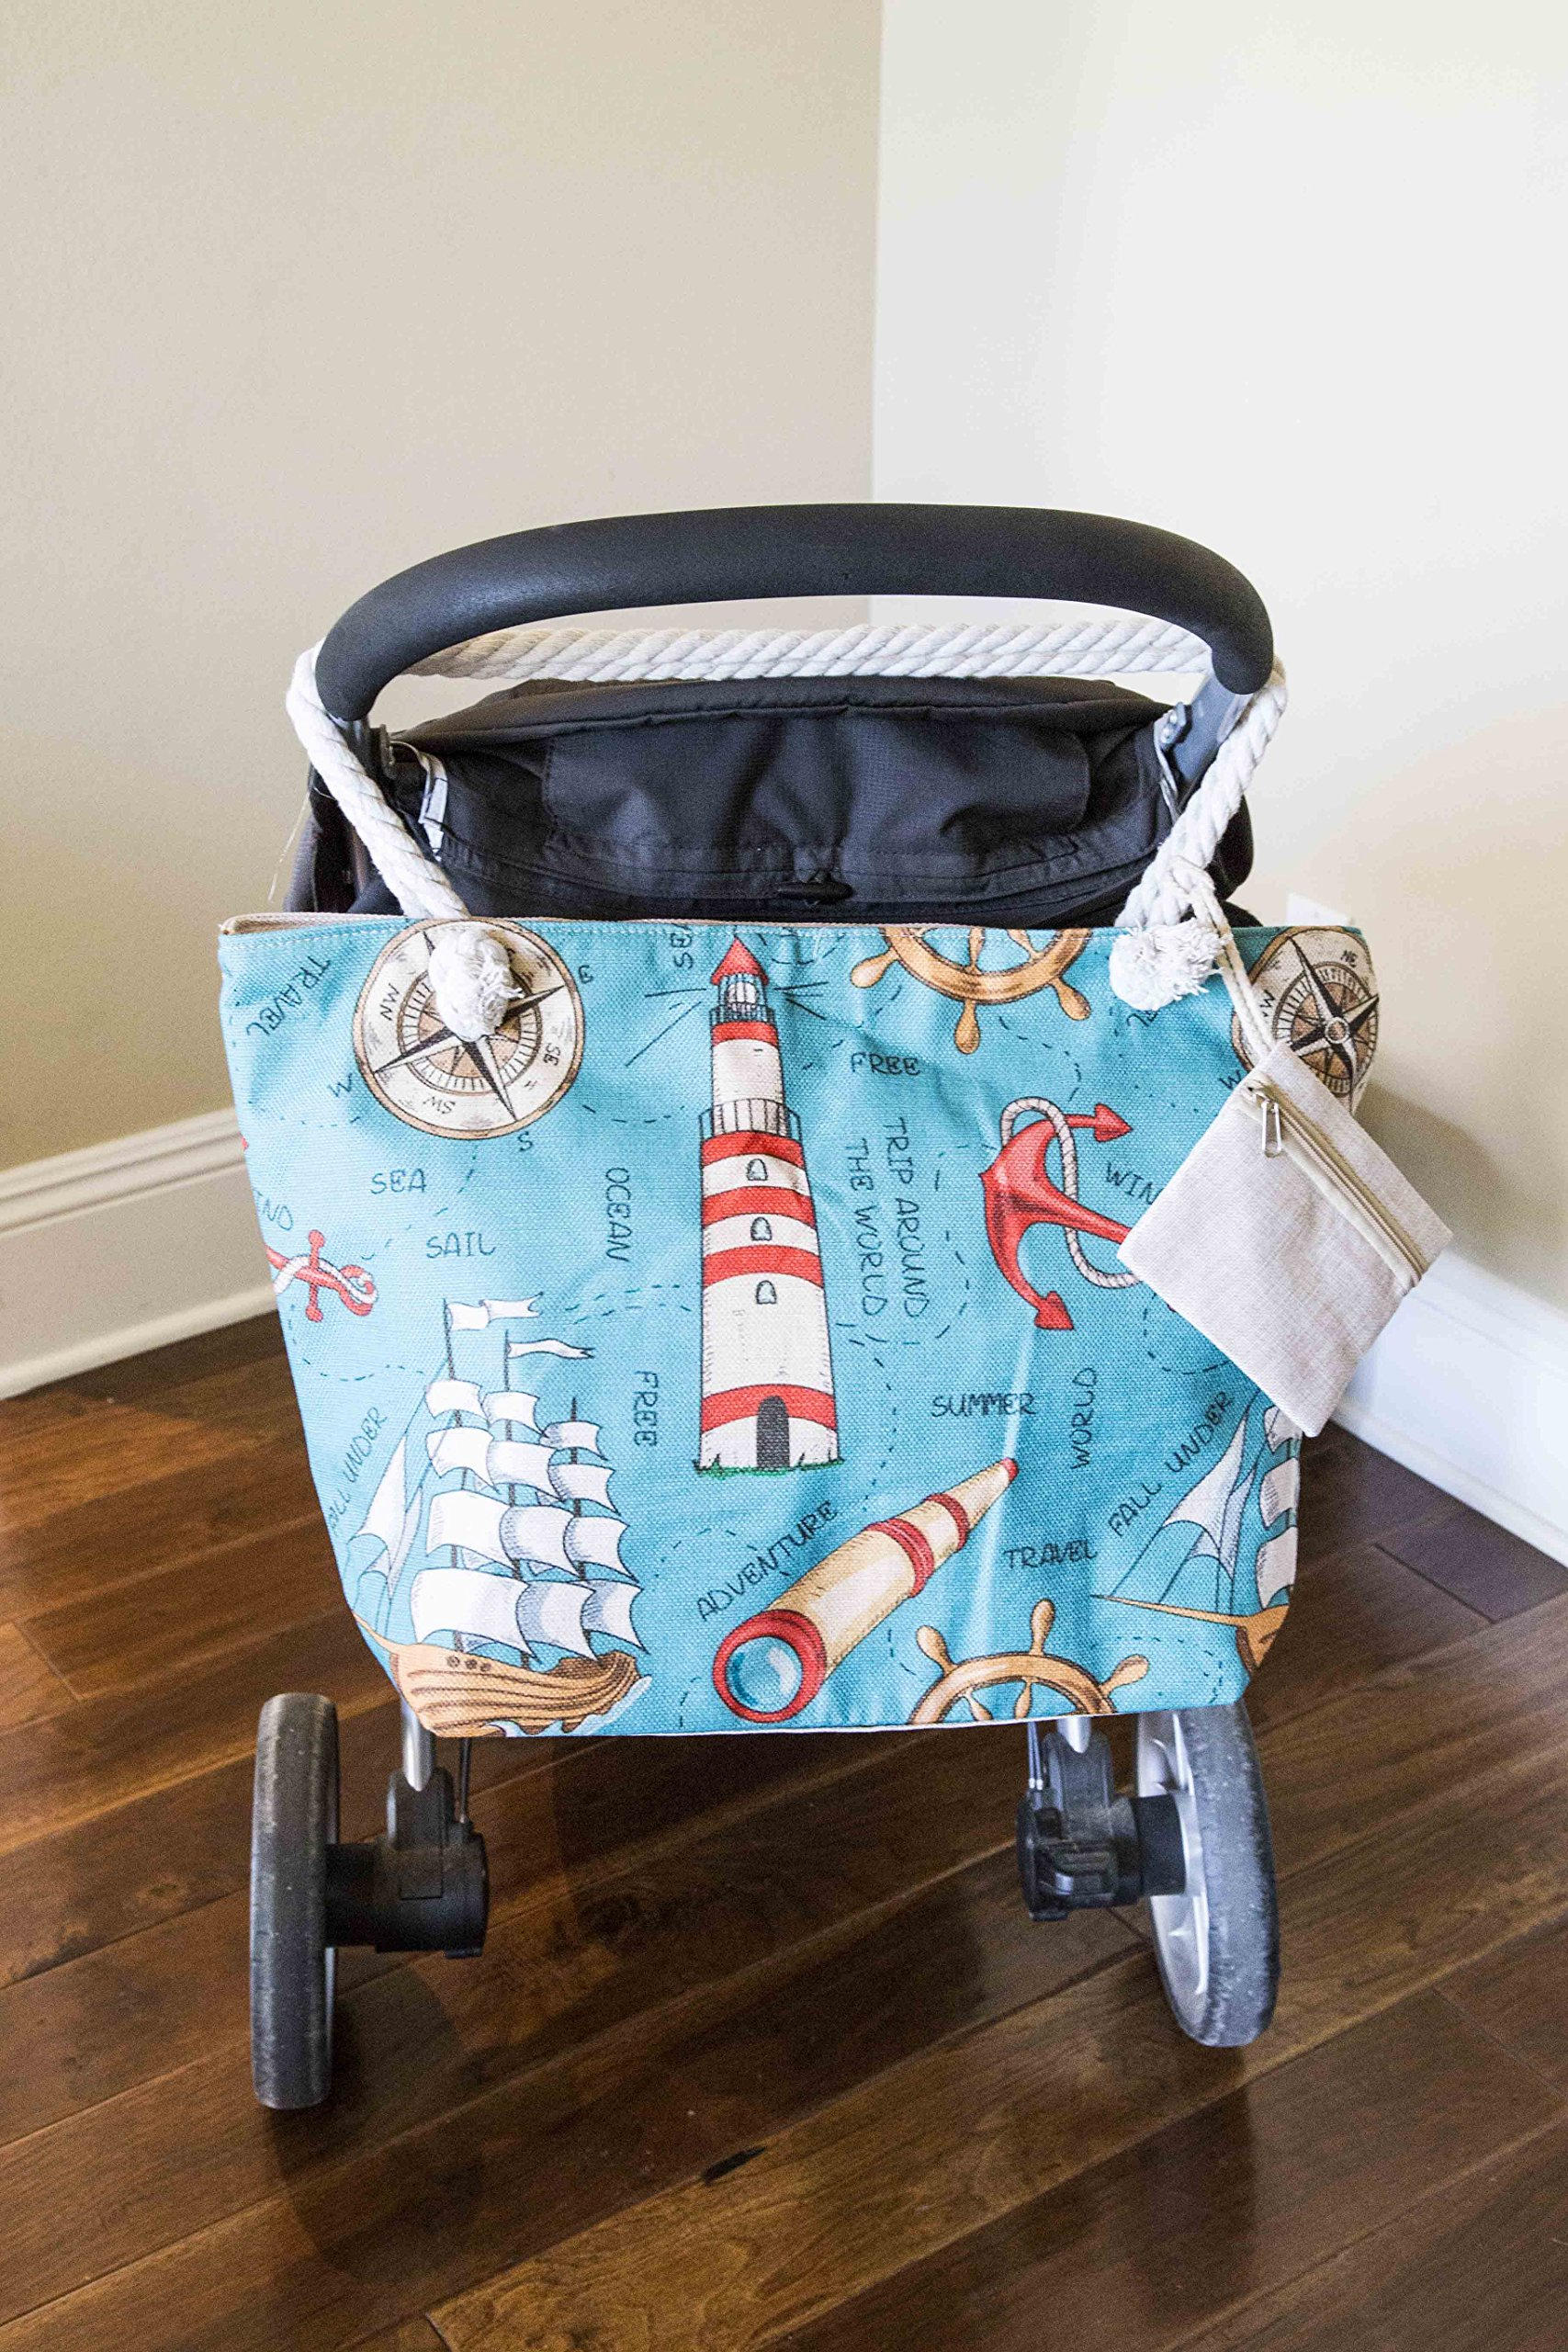 JJMG NEW Summer Beach Bag Stroller Friendly Women's Large Capacity Mom's Tote Beach Shoulder Bag With Rope Handles –Shopping Bag, Diaper Bag, Yoga Bag, Toys, Towels, Swim Suits, etc. by JJMG (Image #6)